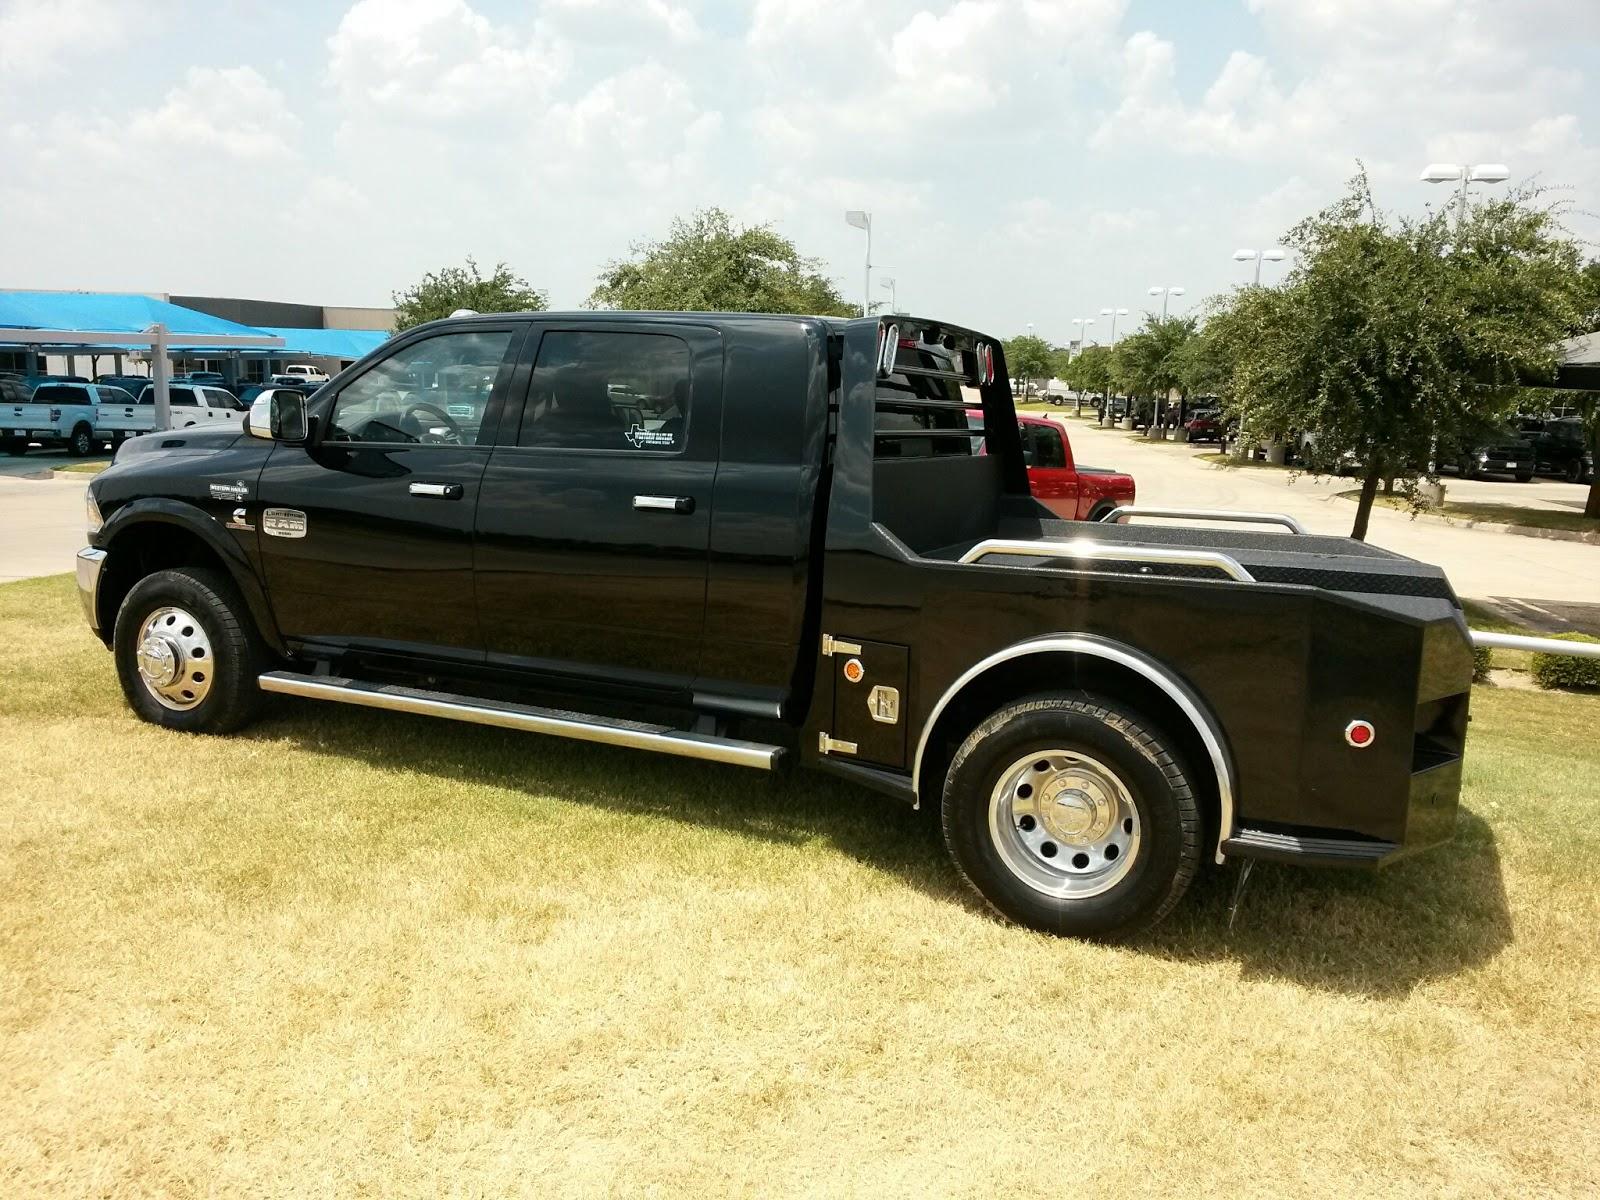 video new black pearl 2015 ram 3500 laramie longhorn mega cab 4x4 western hauler flatbed tdy. Black Bedroom Furniture Sets. Home Design Ideas